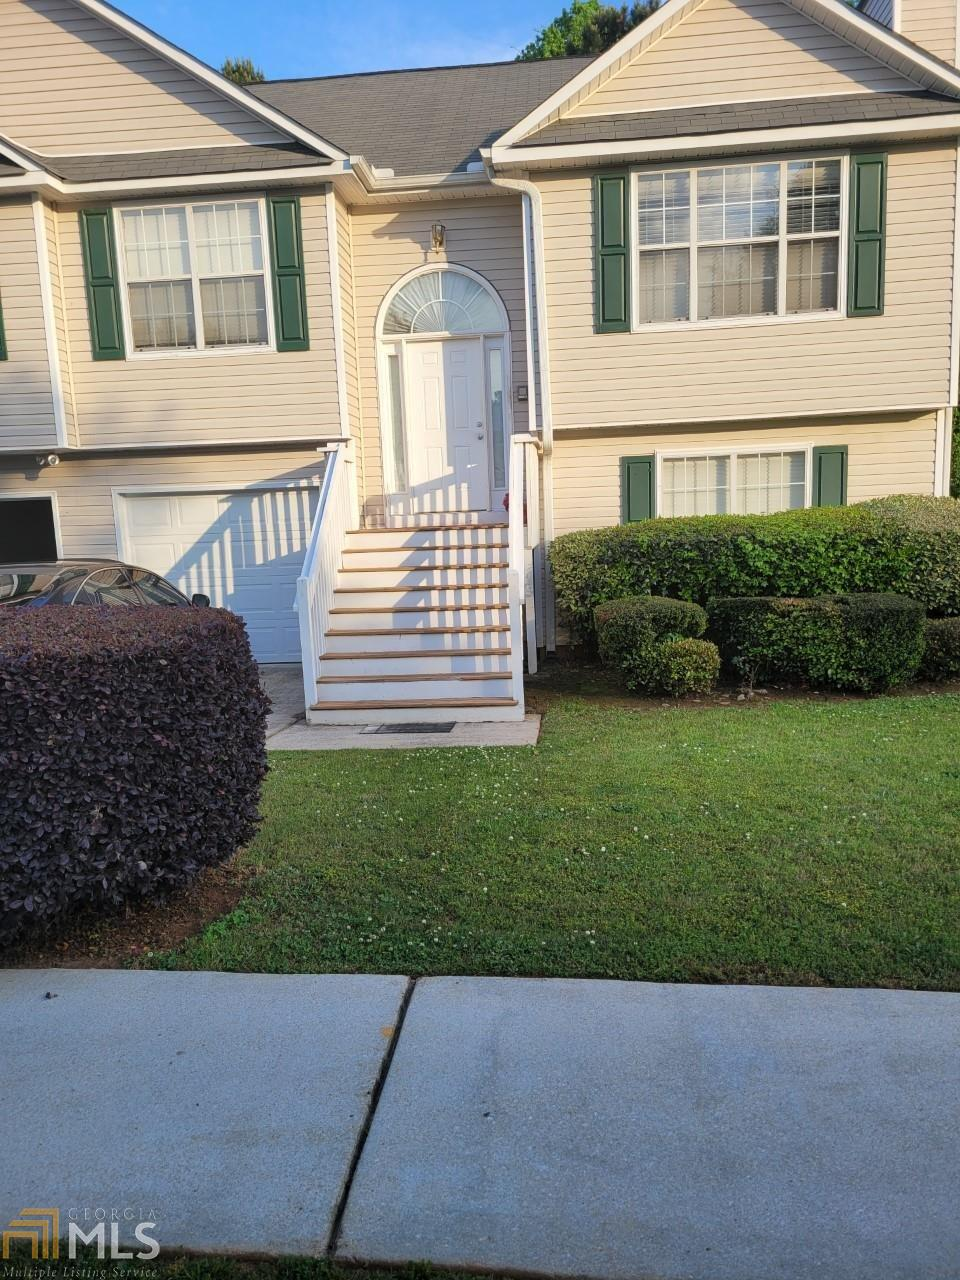 318 Summer Hill Cir, Stockbridge, Georgia 30281, 4 Bedrooms Bedrooms, ,3 BathroomsBathrooms,Single Family,For Sale,318 Summer Hill Cir,1,8968955